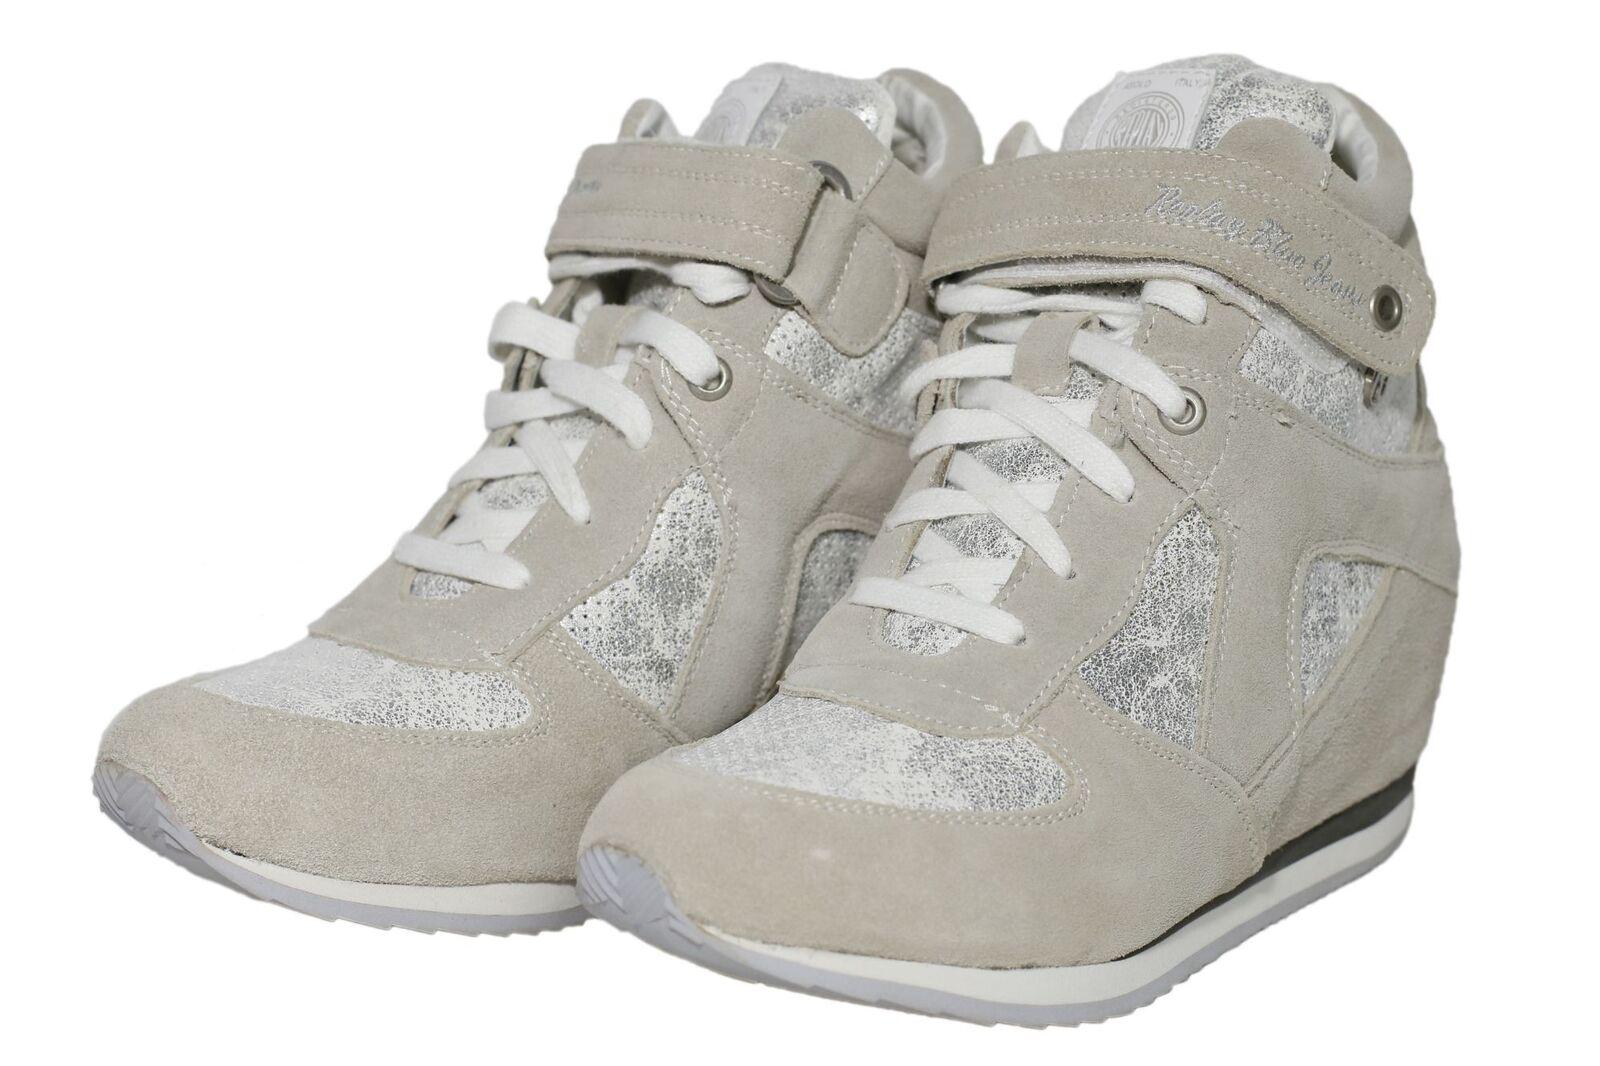 REPLAY FELY High Sneaker Top Sneaker High in pelle da donna 55ad3c